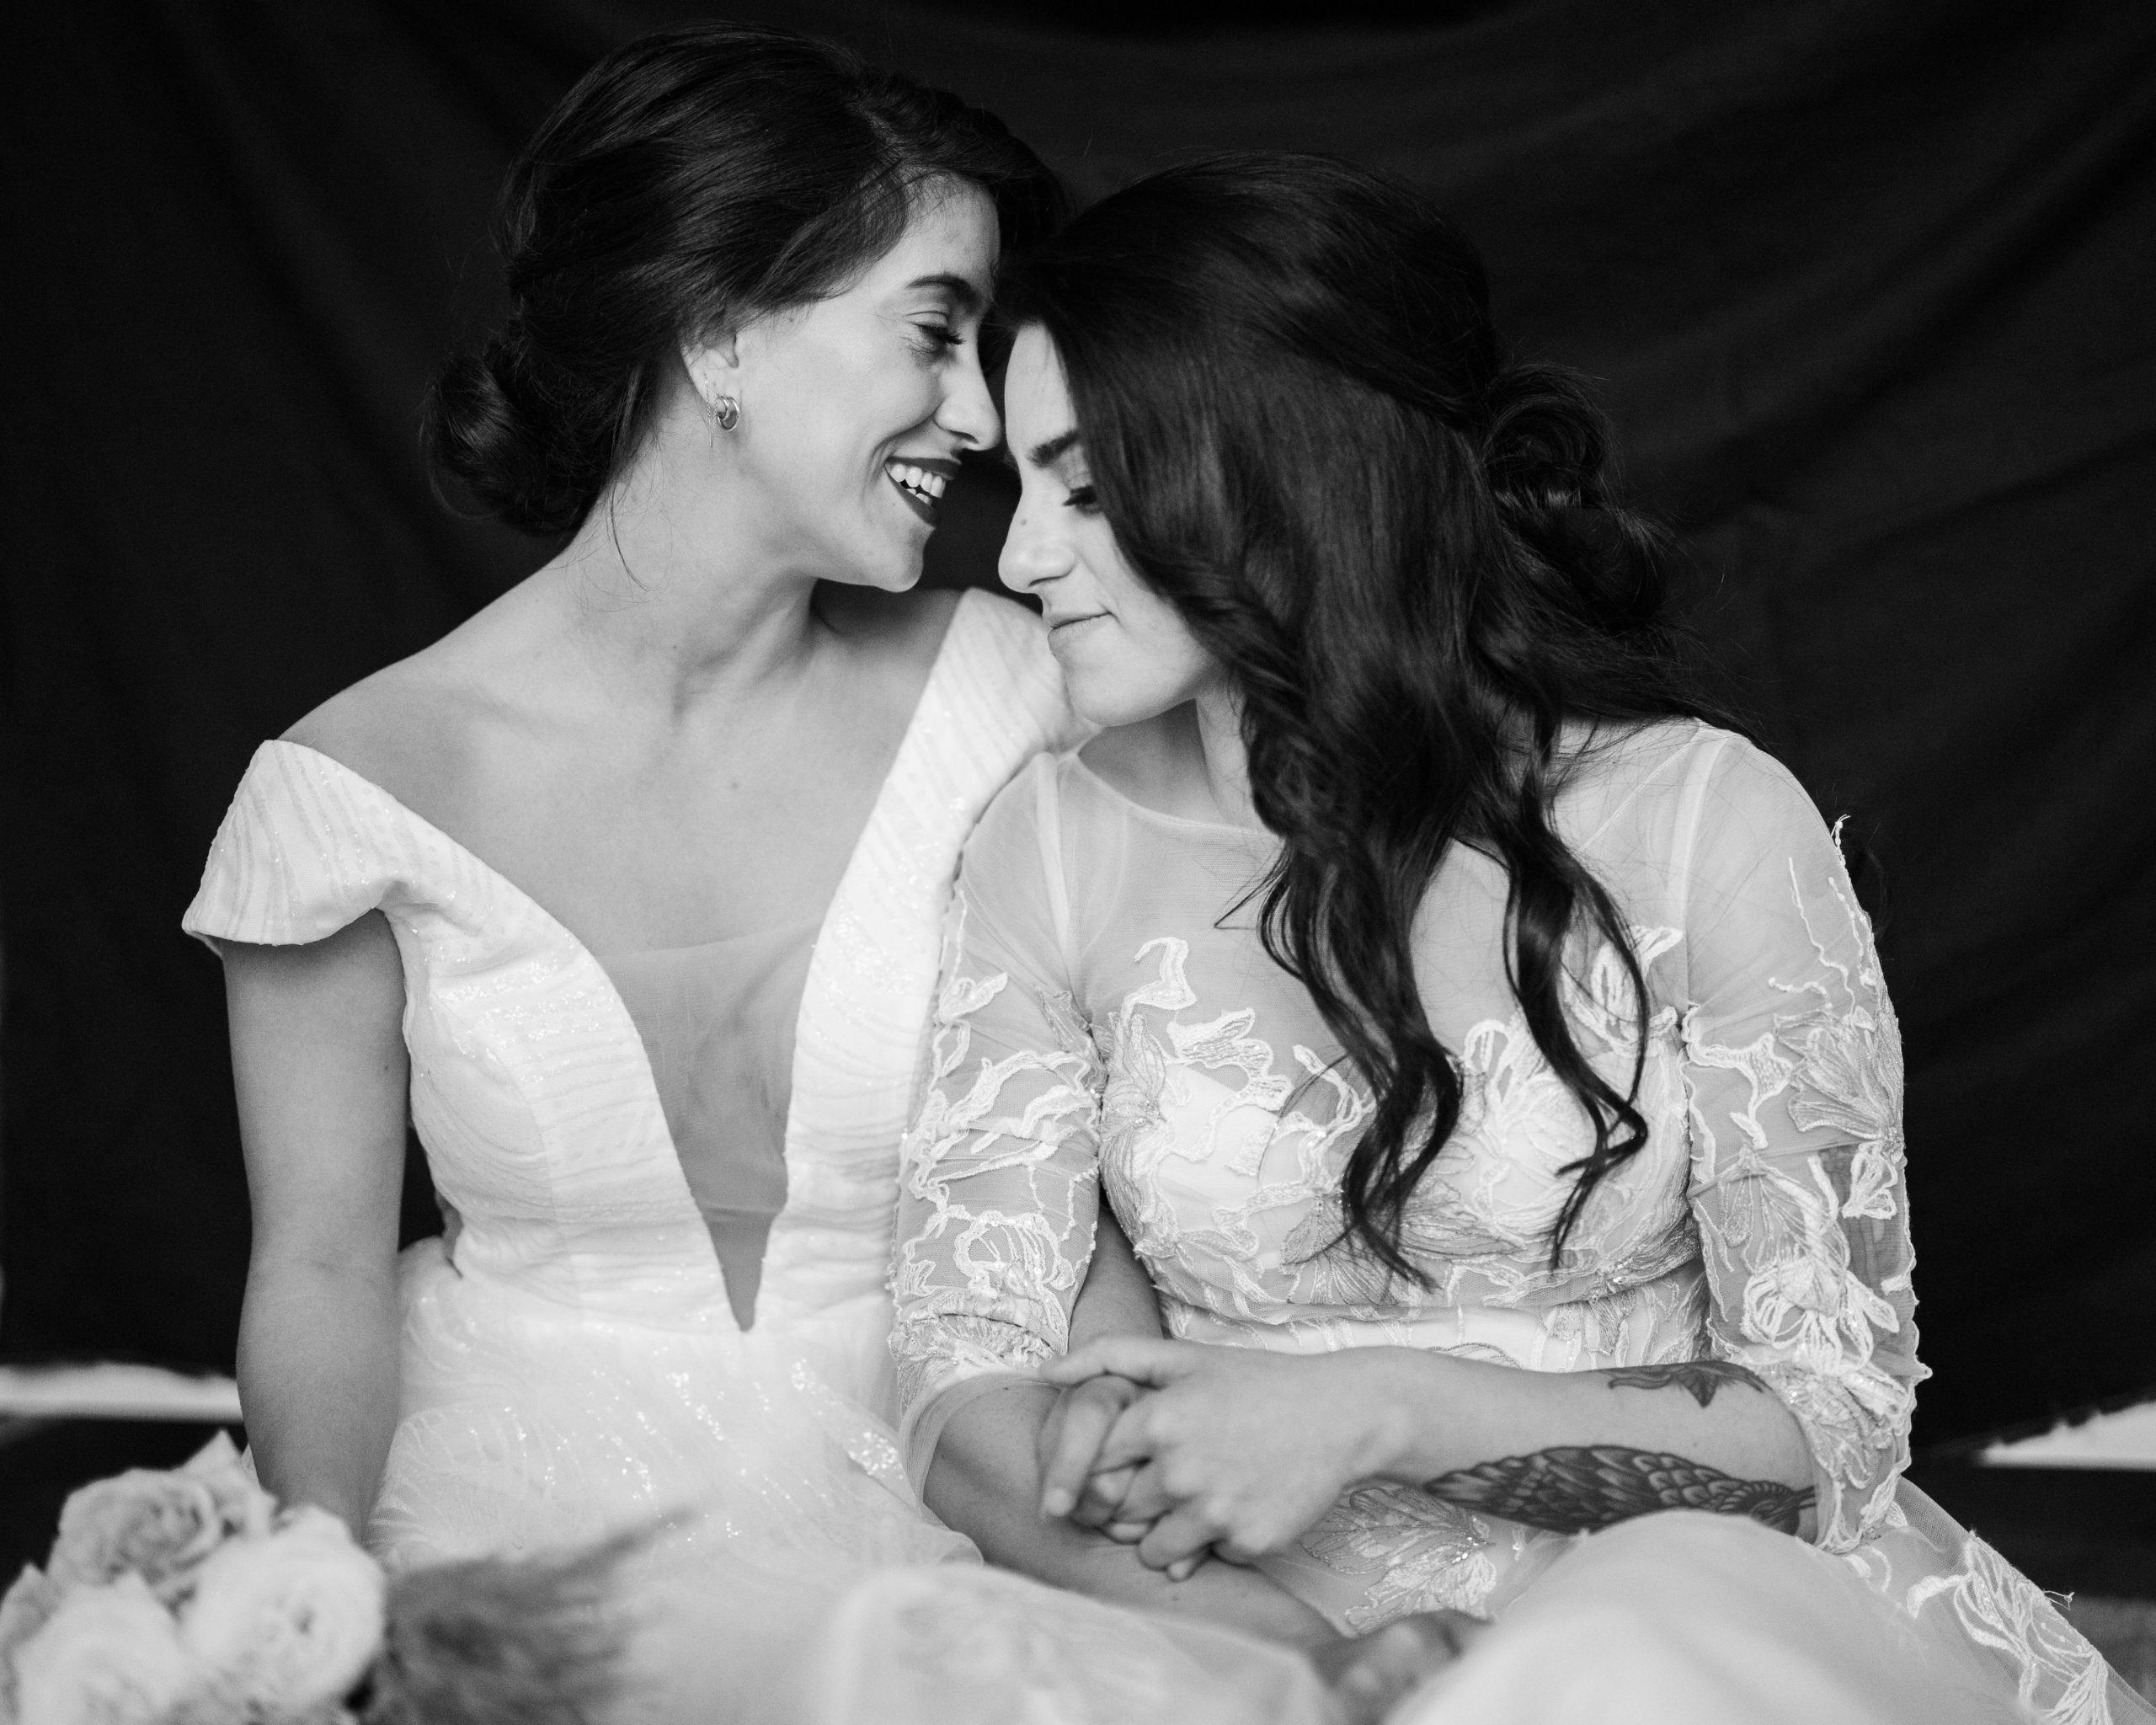 Ideas for same-sex weddings